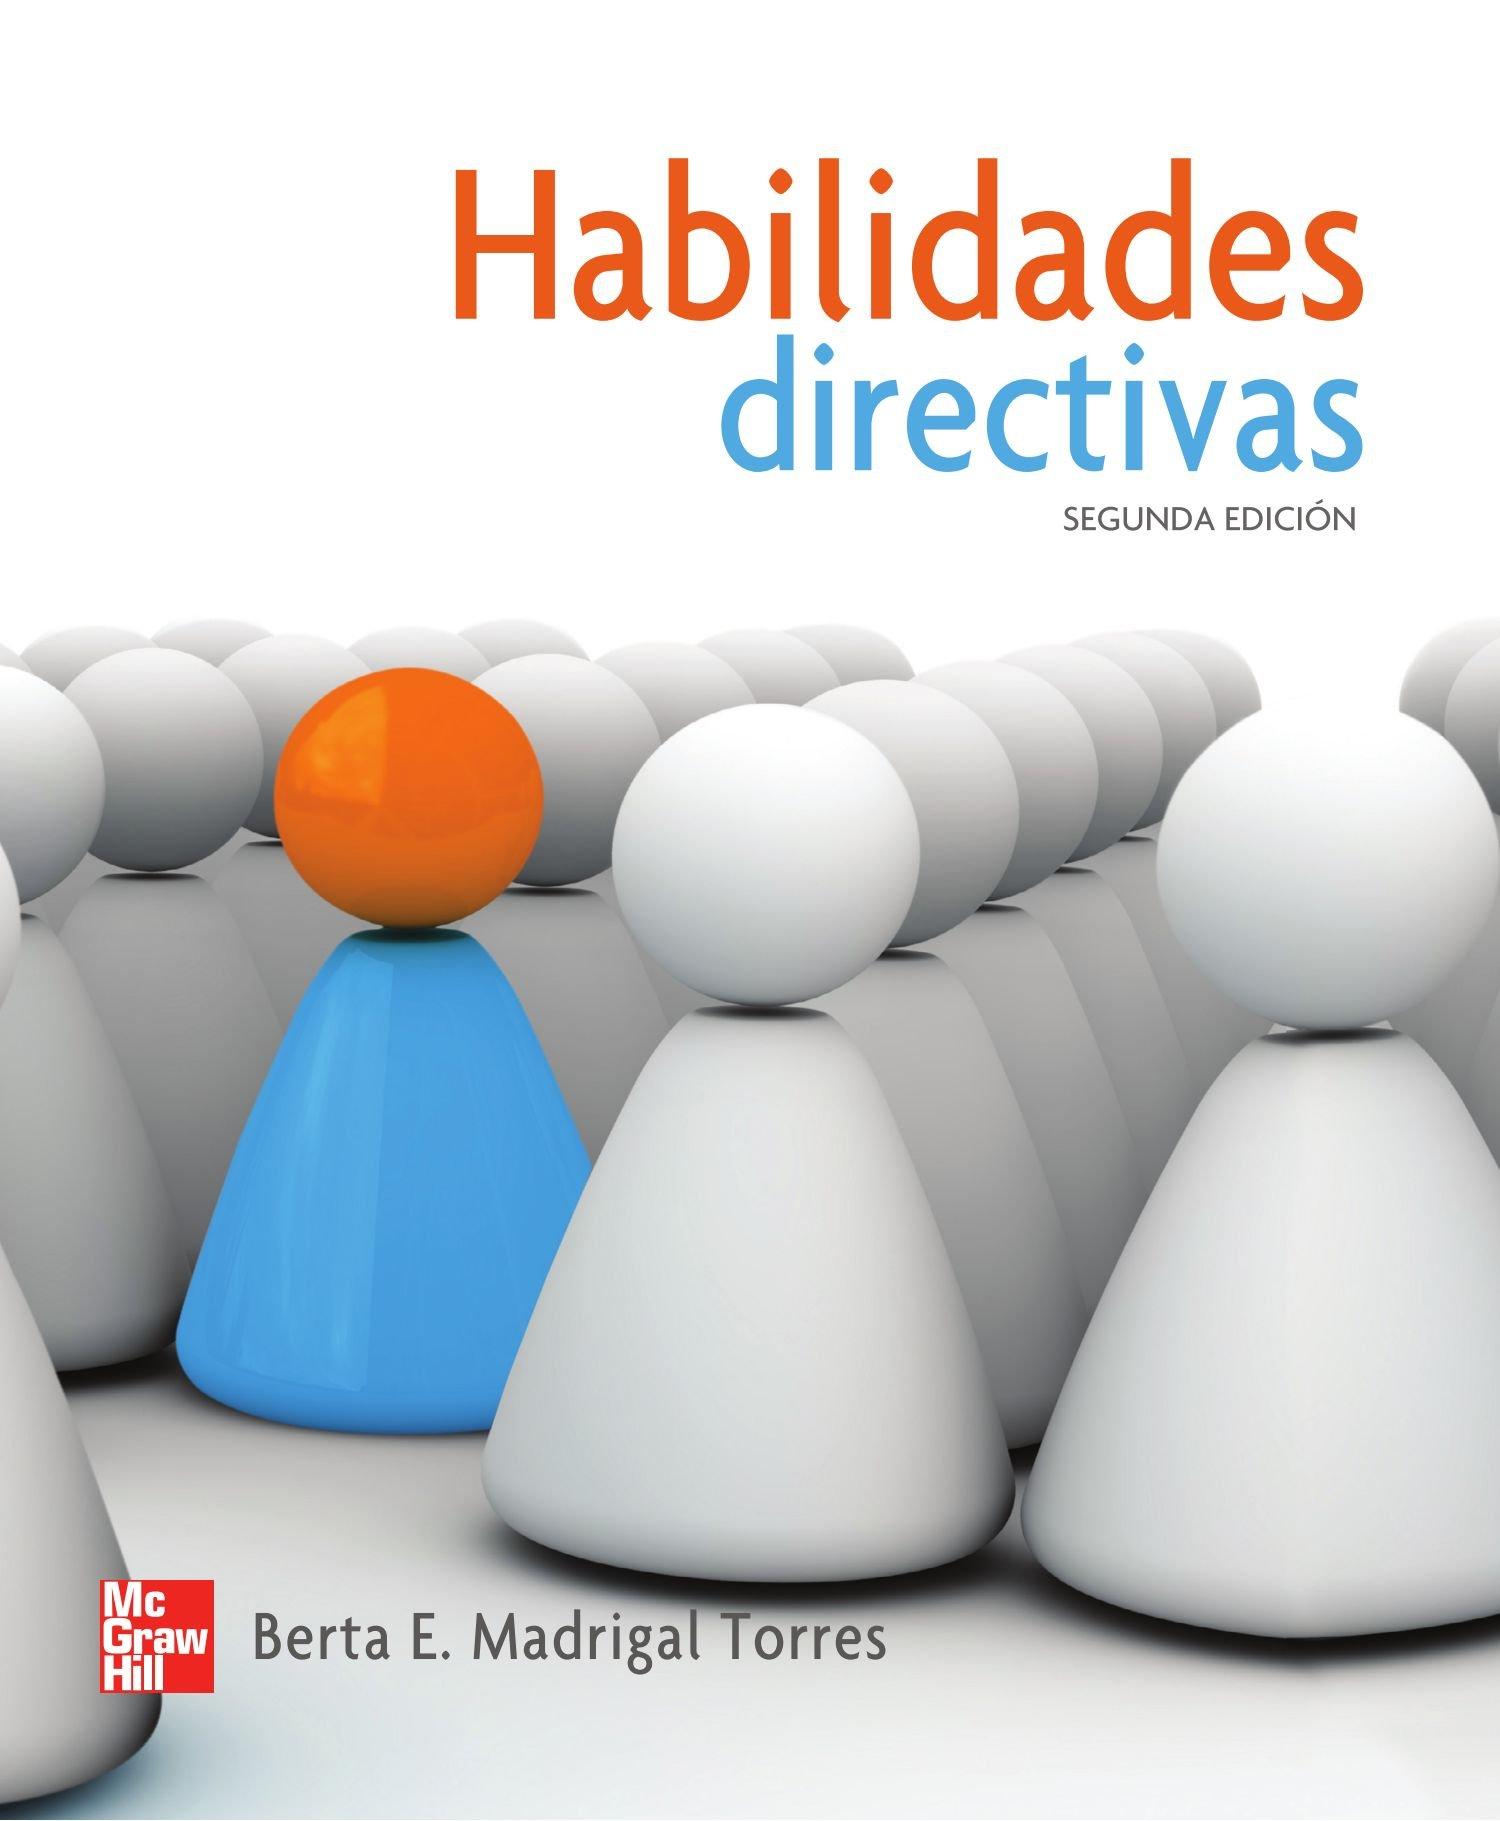 habilidades directivas berta madrigal pdf gratis